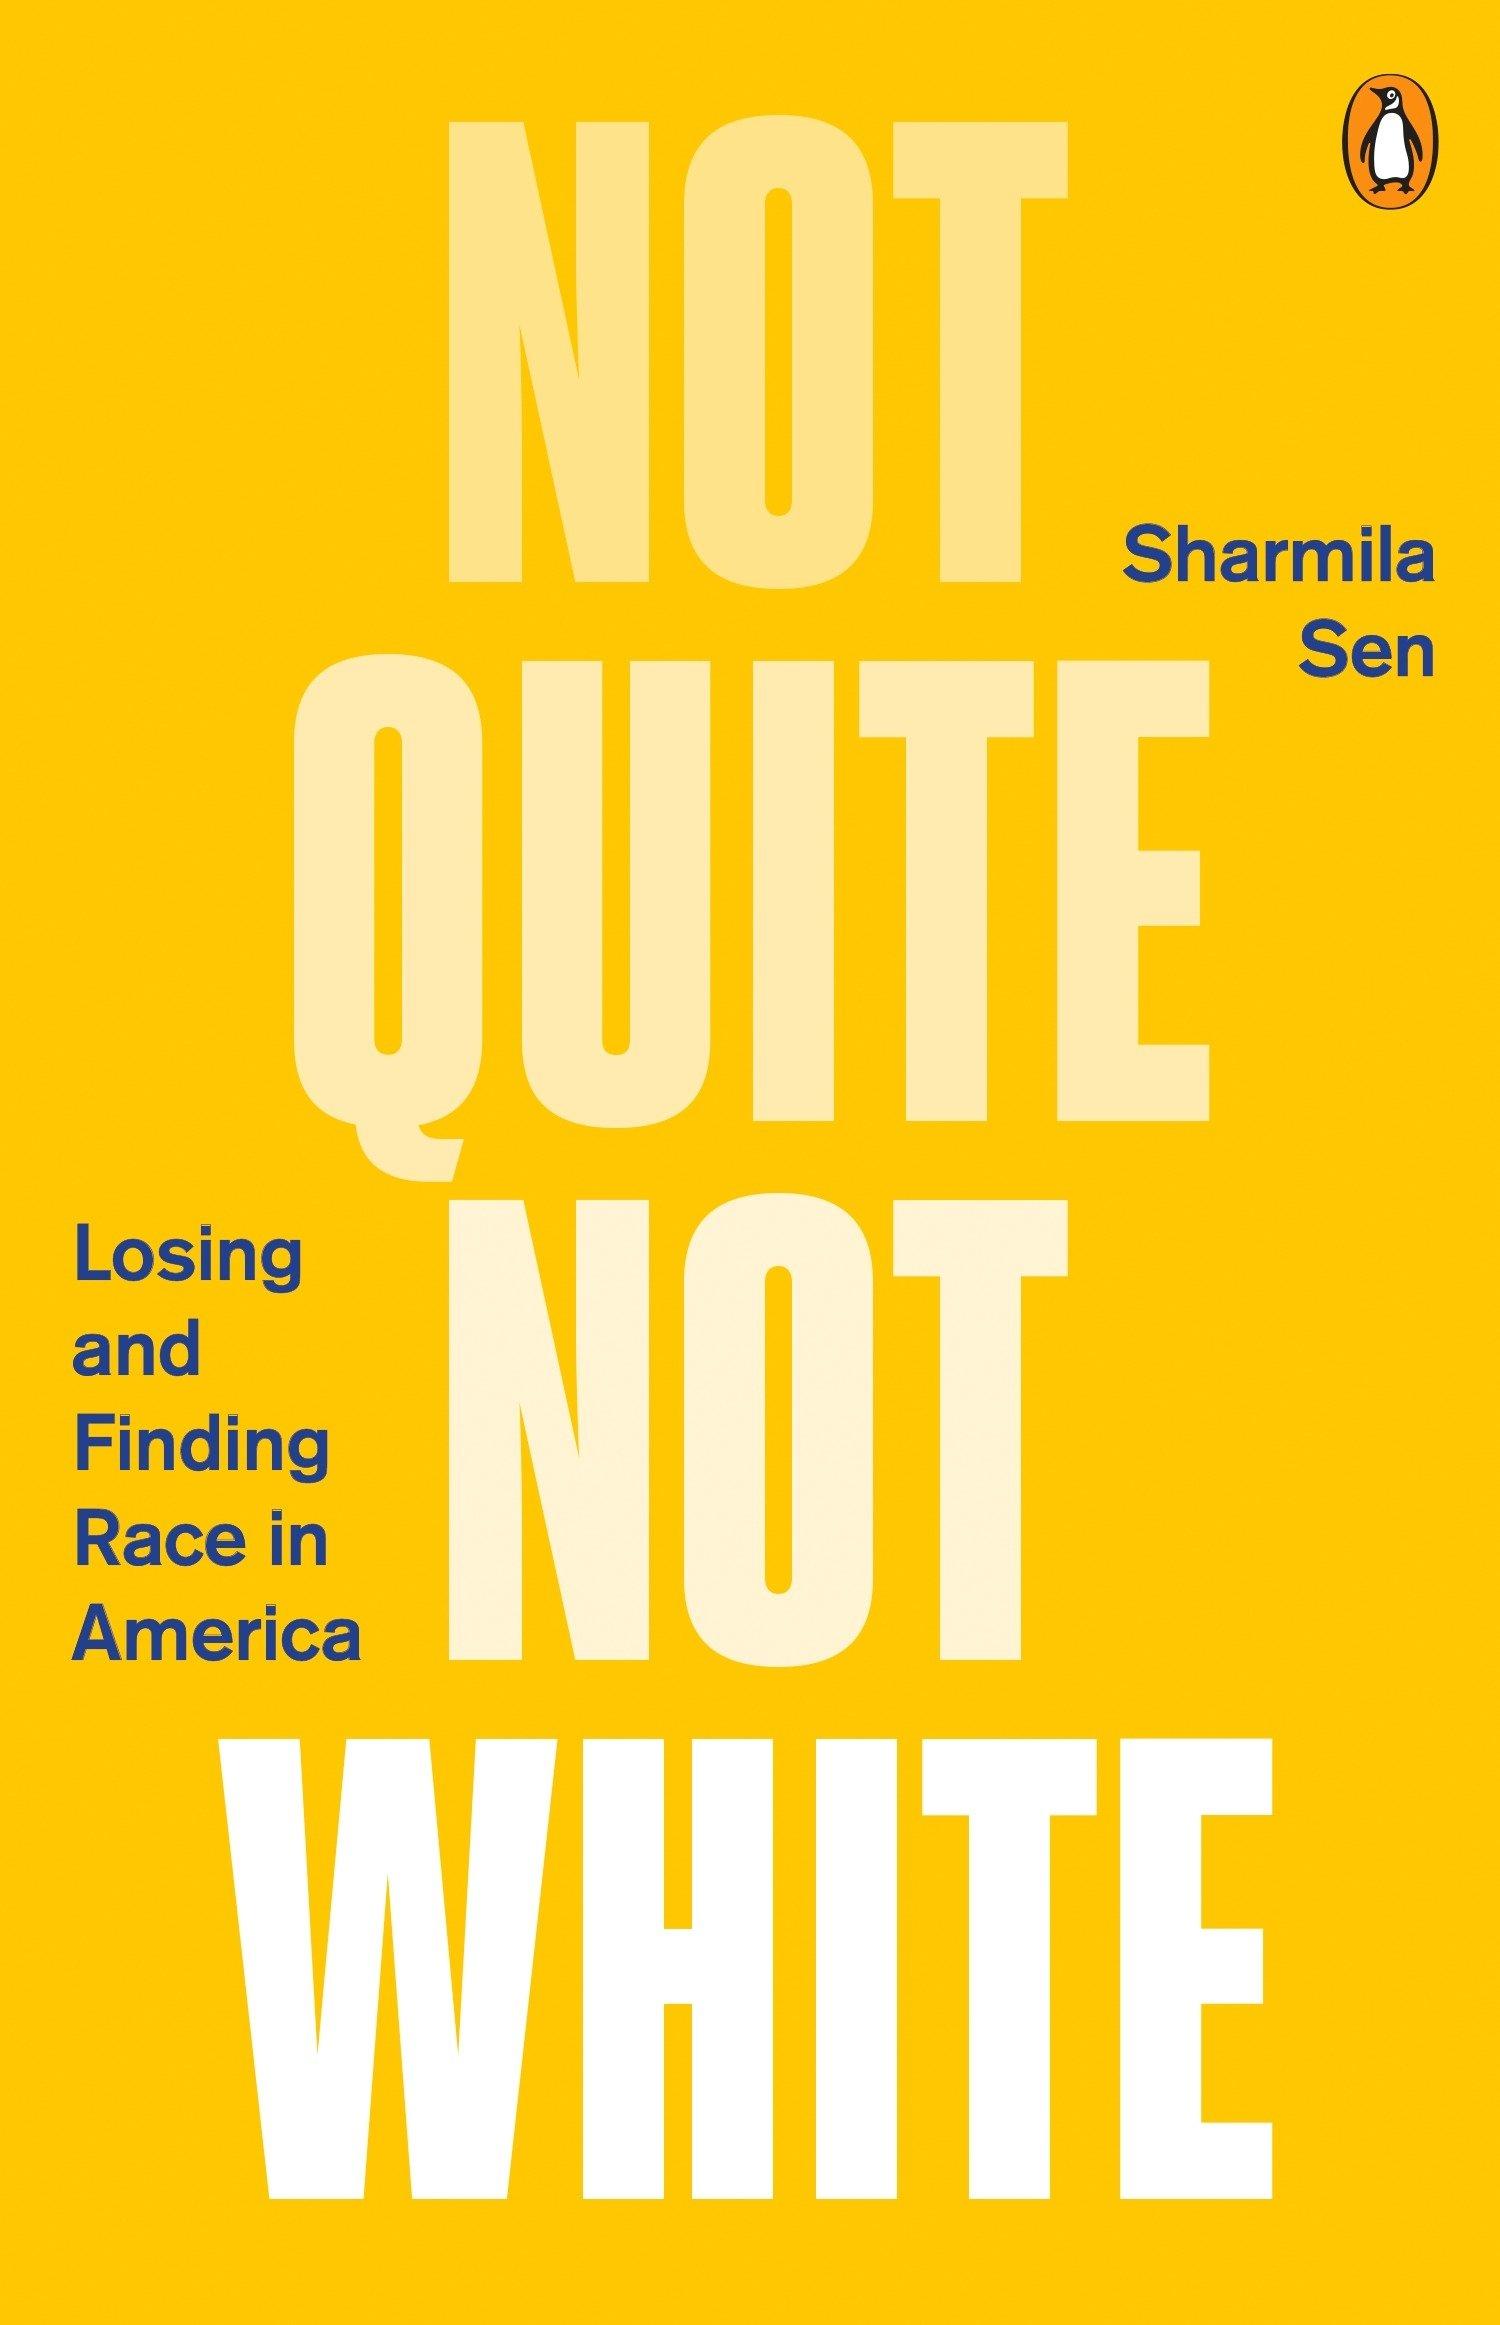 Not quite white by Sharmila Sen